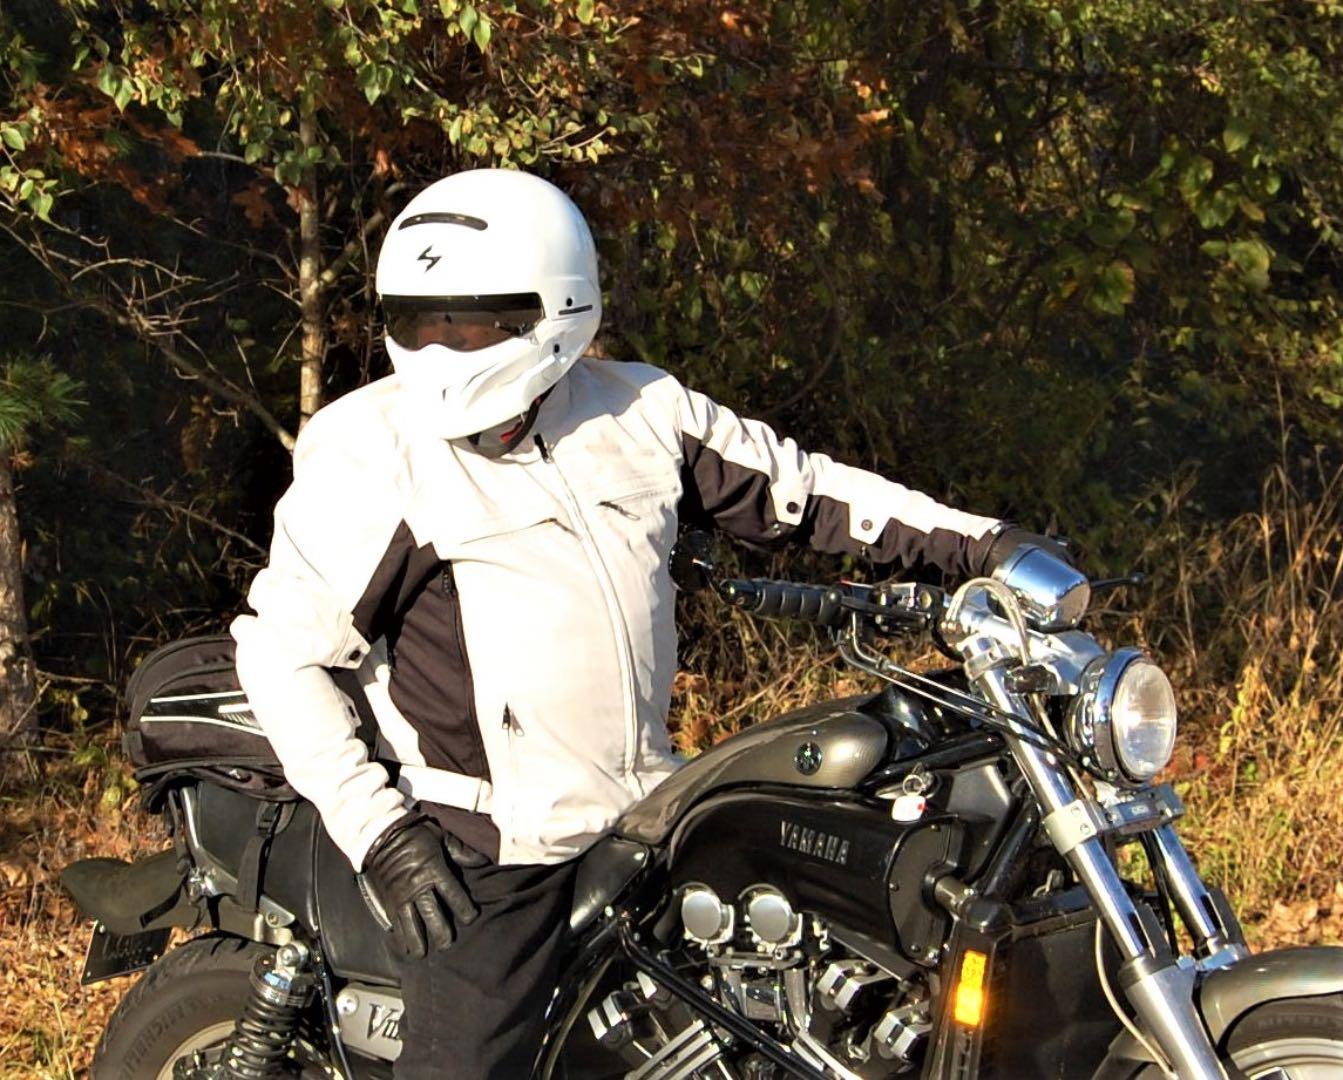 Scorpion StealthPack jacket test